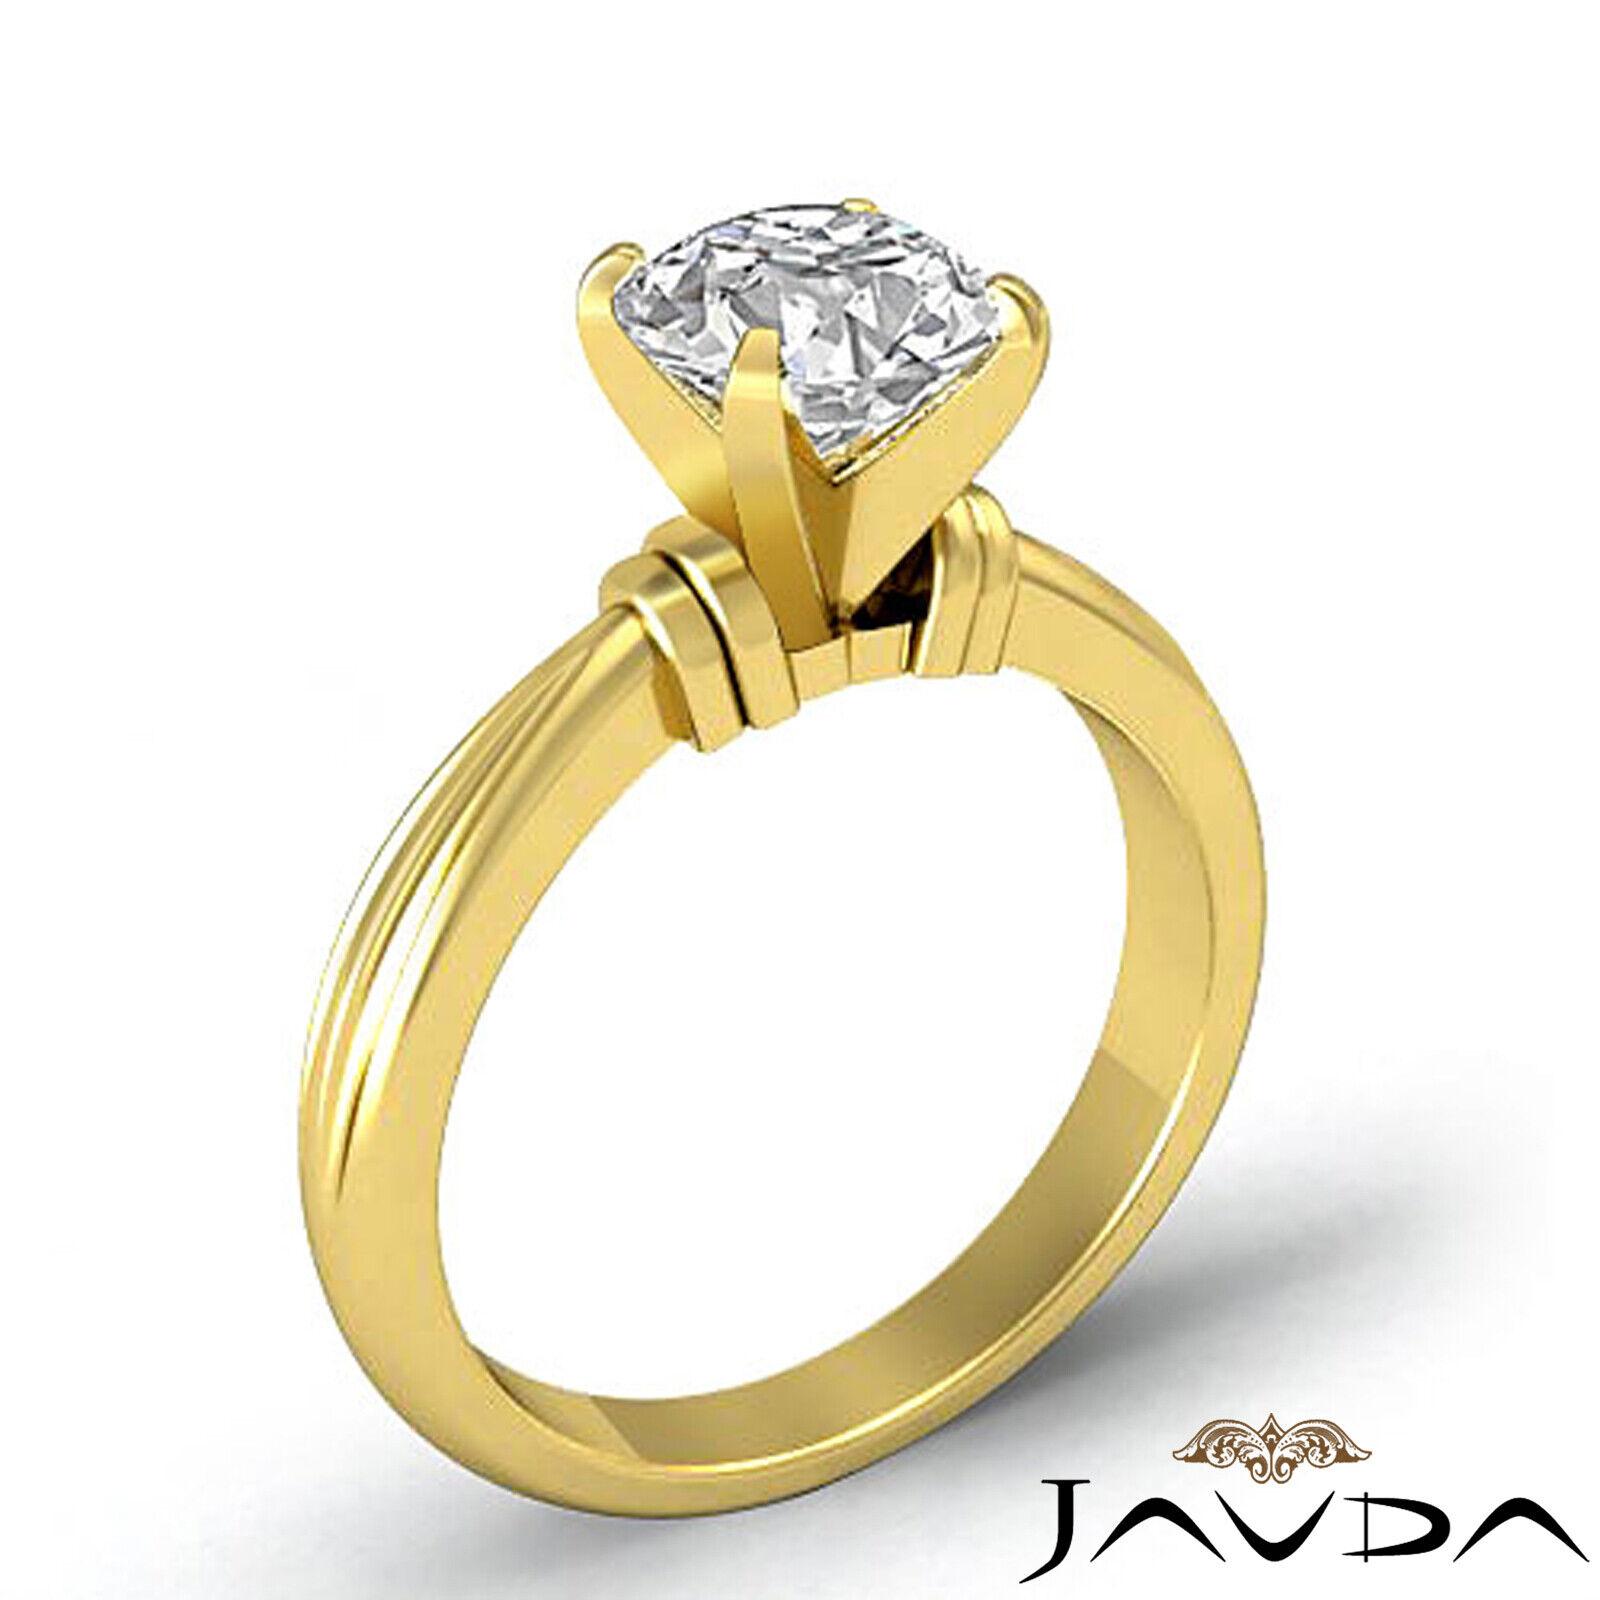 Round Solitaire Natural GIA H Color VVS2 Diamond Women's Engagement Ring 1 ctw. 3